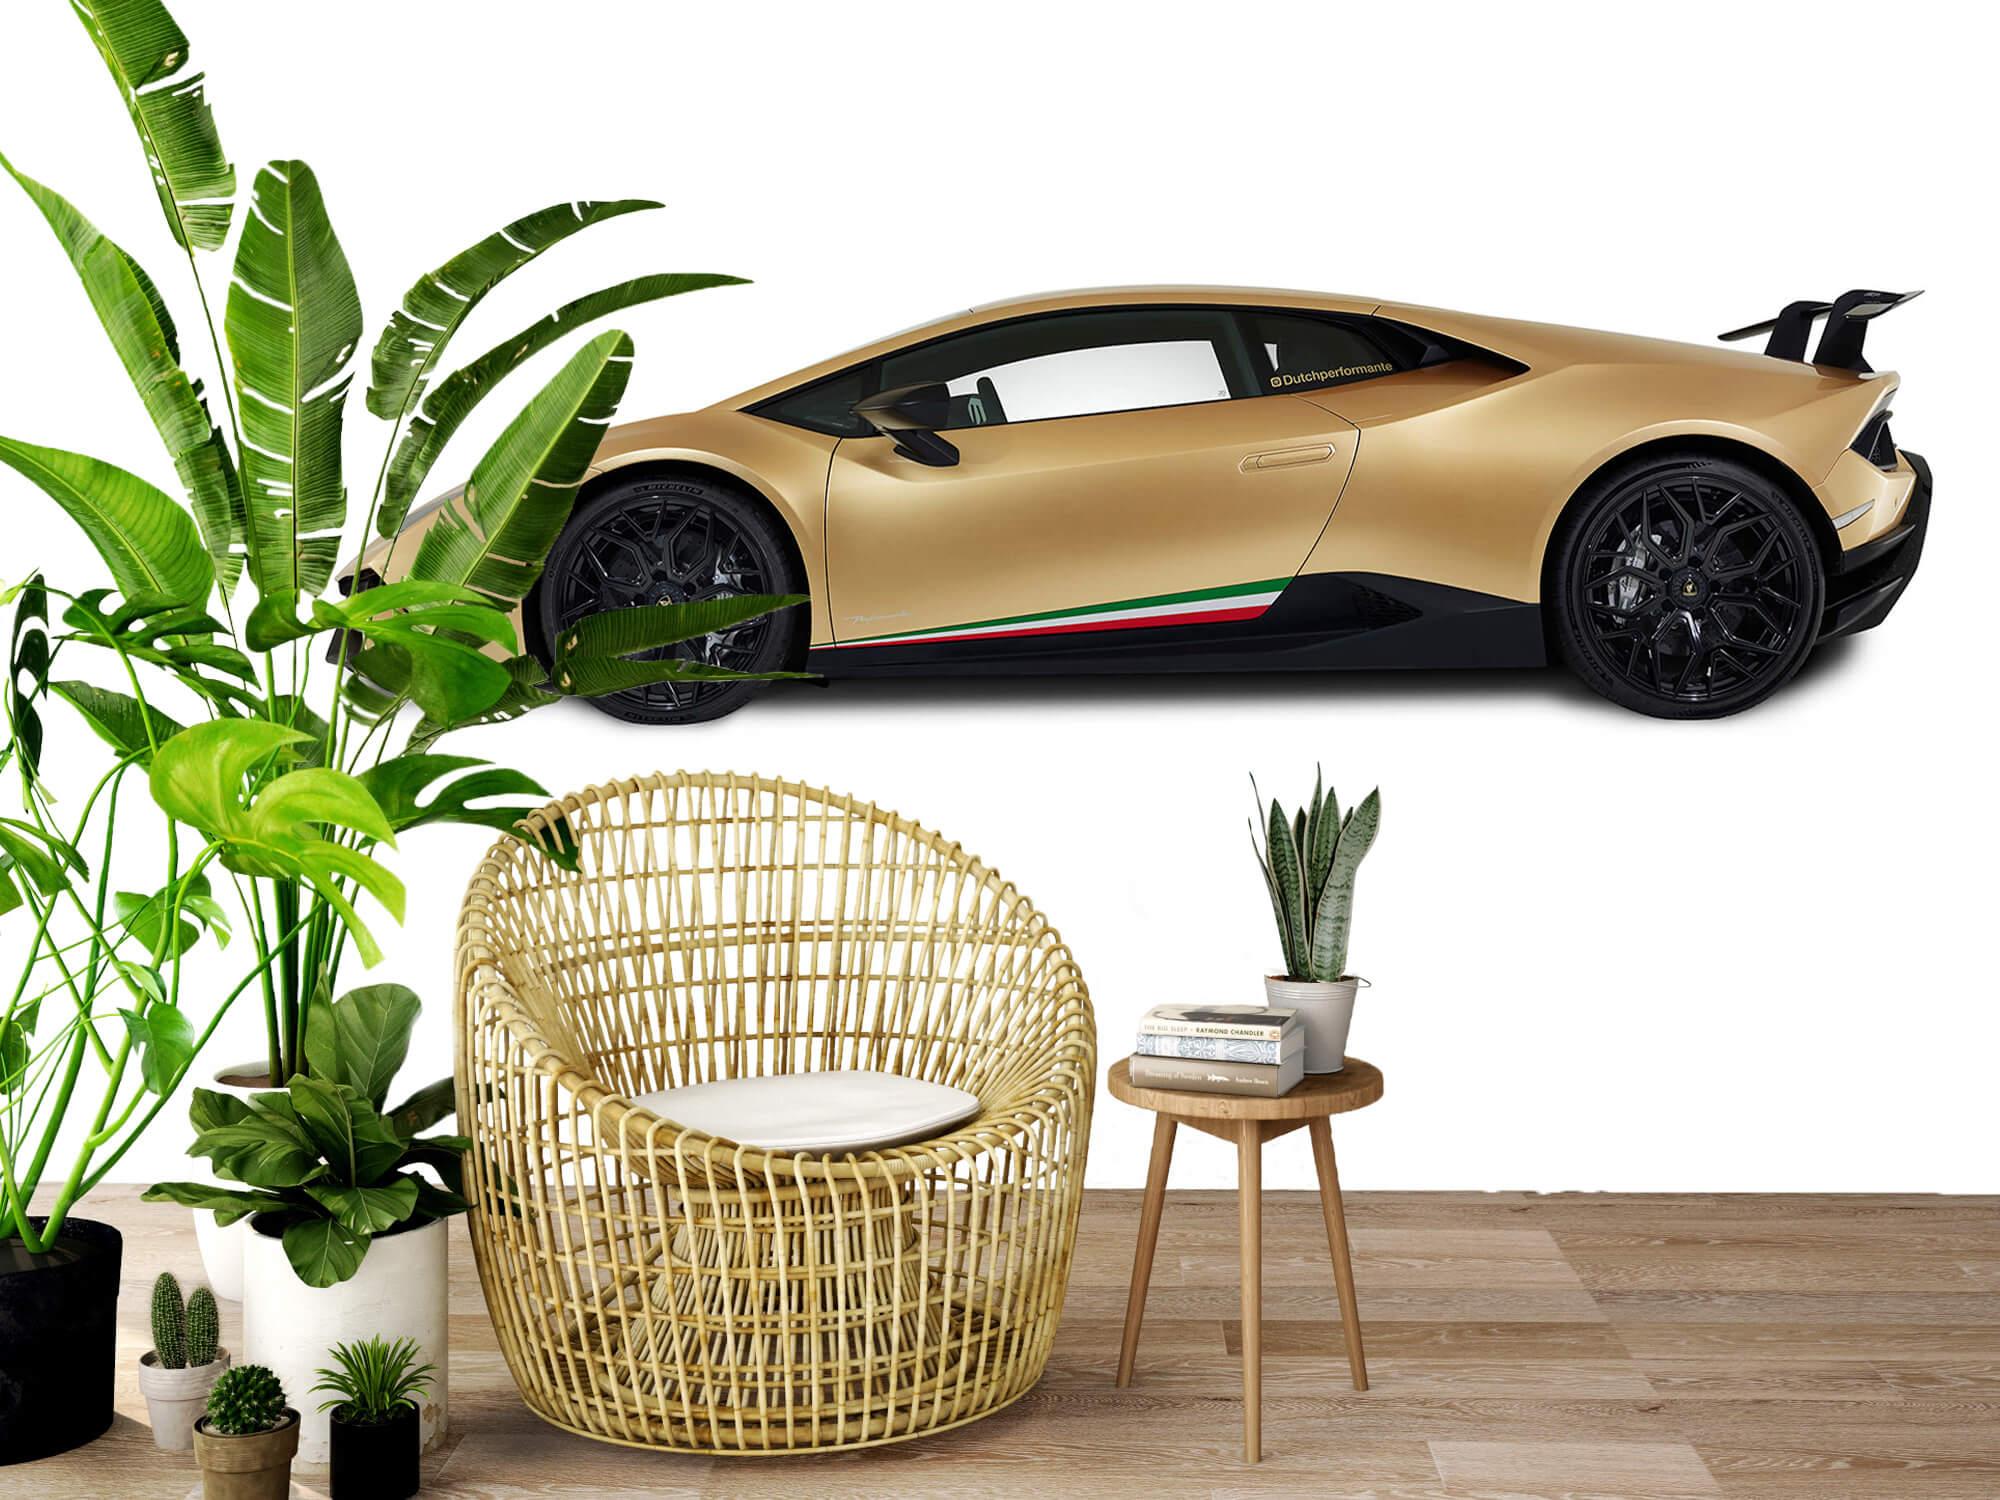 Wallpaper Lamborghini Huracán - Zijkant, wit 9